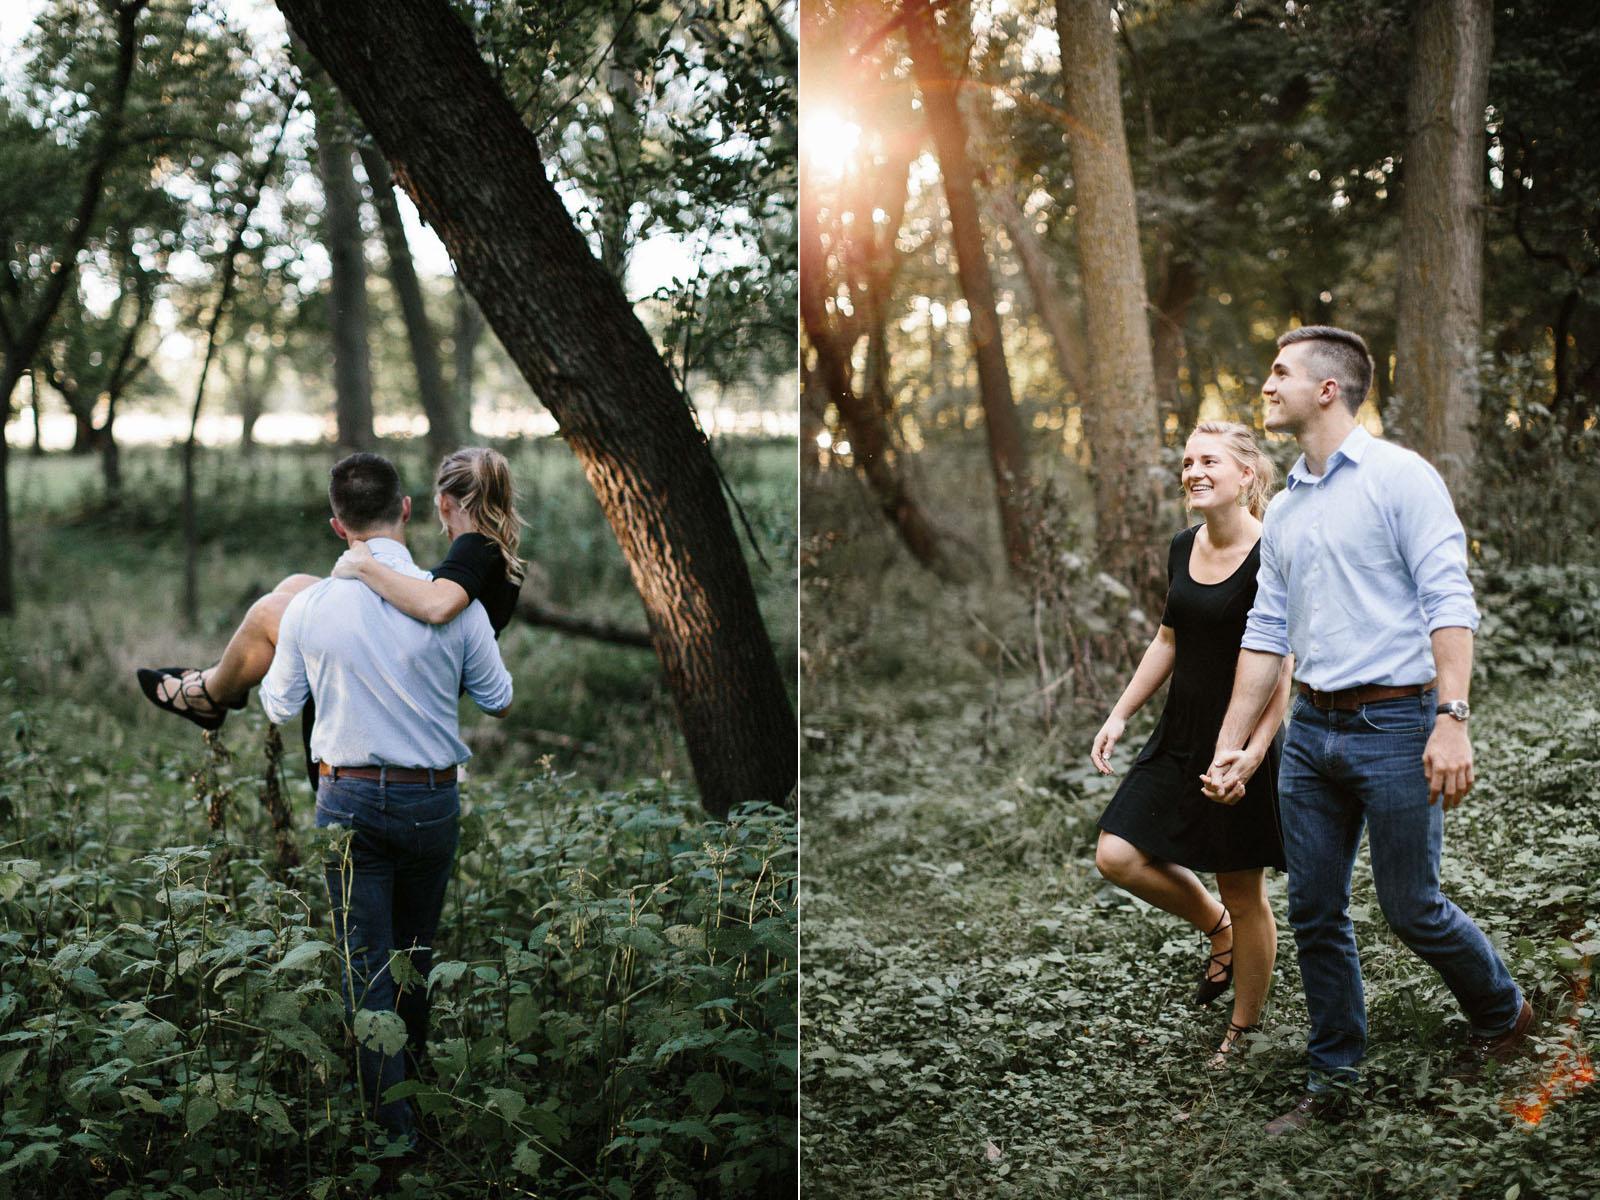 Romantic_Timeless_Downtown_SiouxFalls_Engagement_Wedding_Photographer_37.jpg